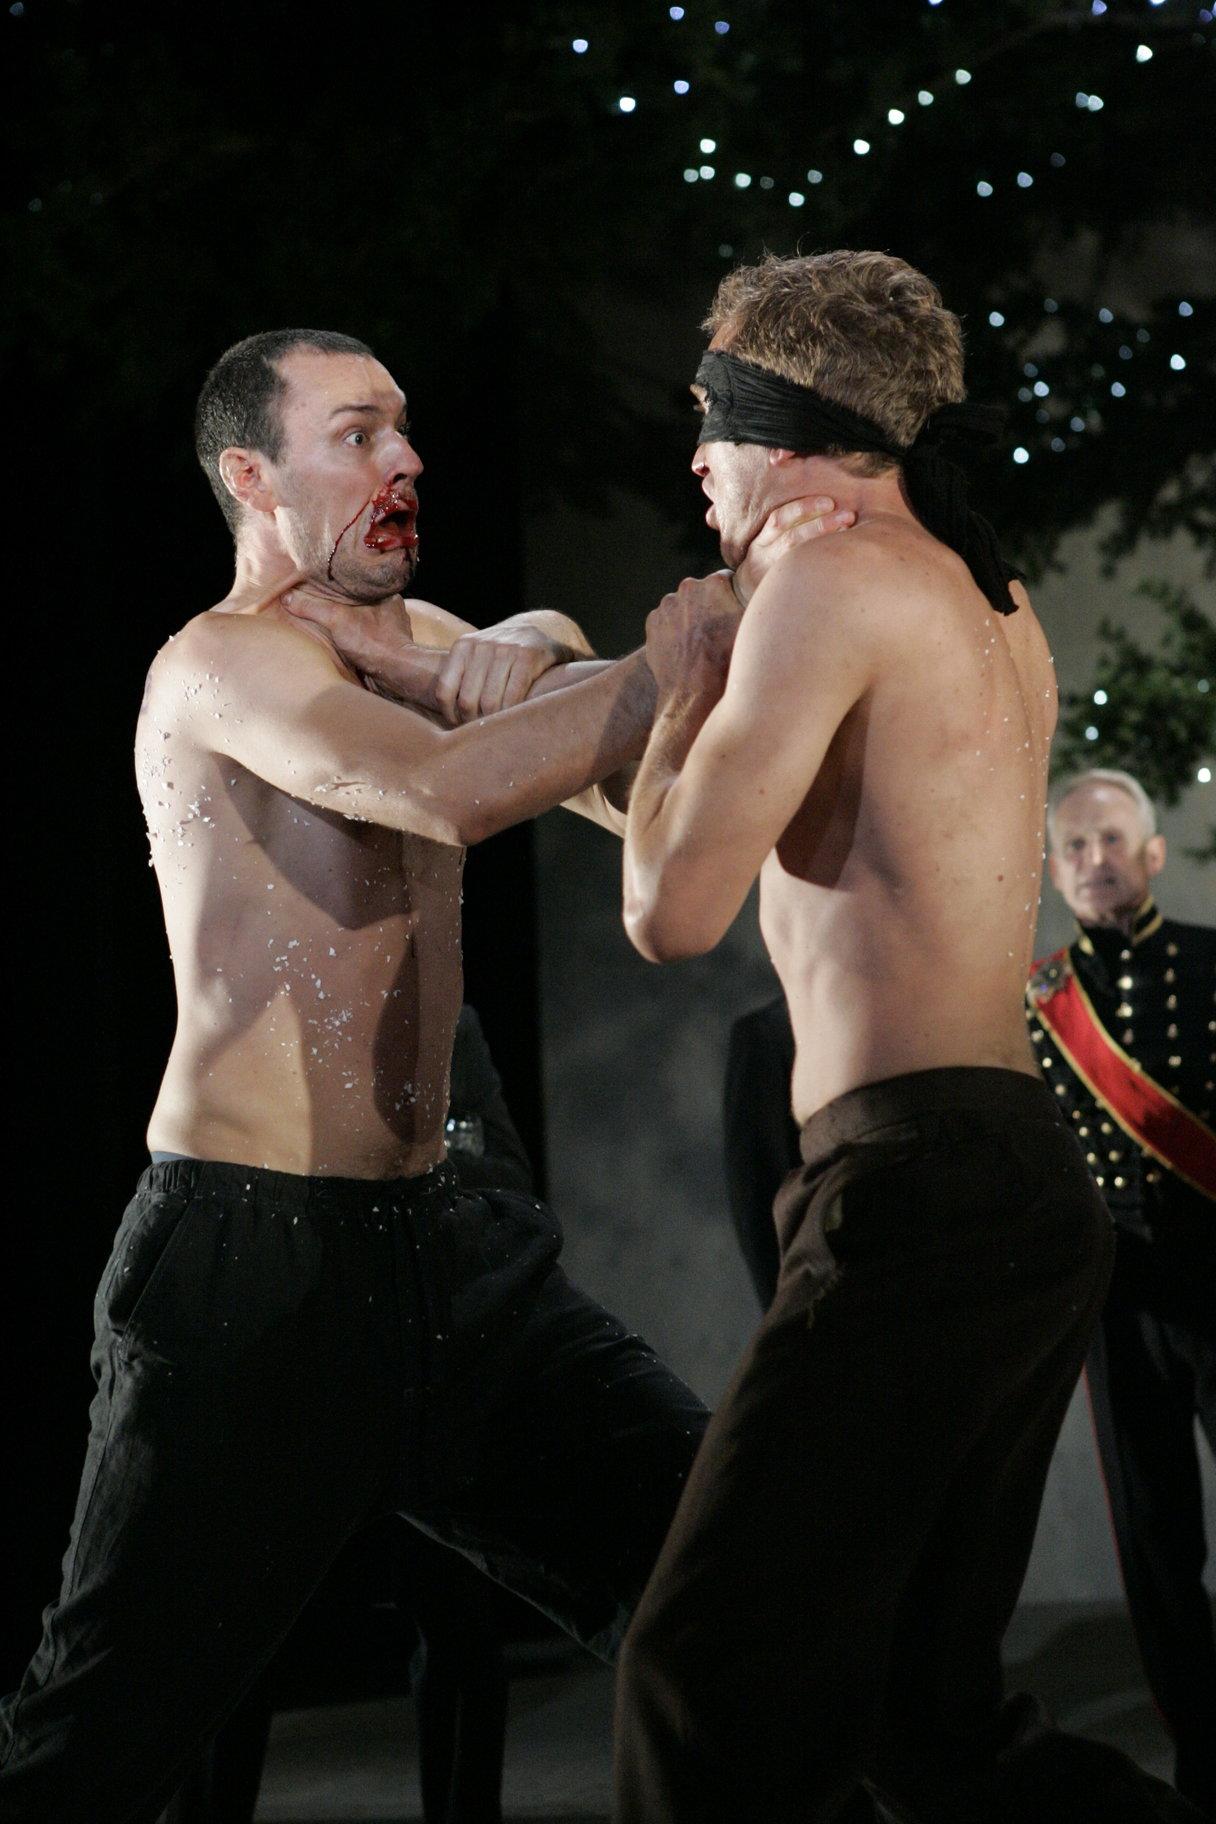 Charles and Orlando wrestle.